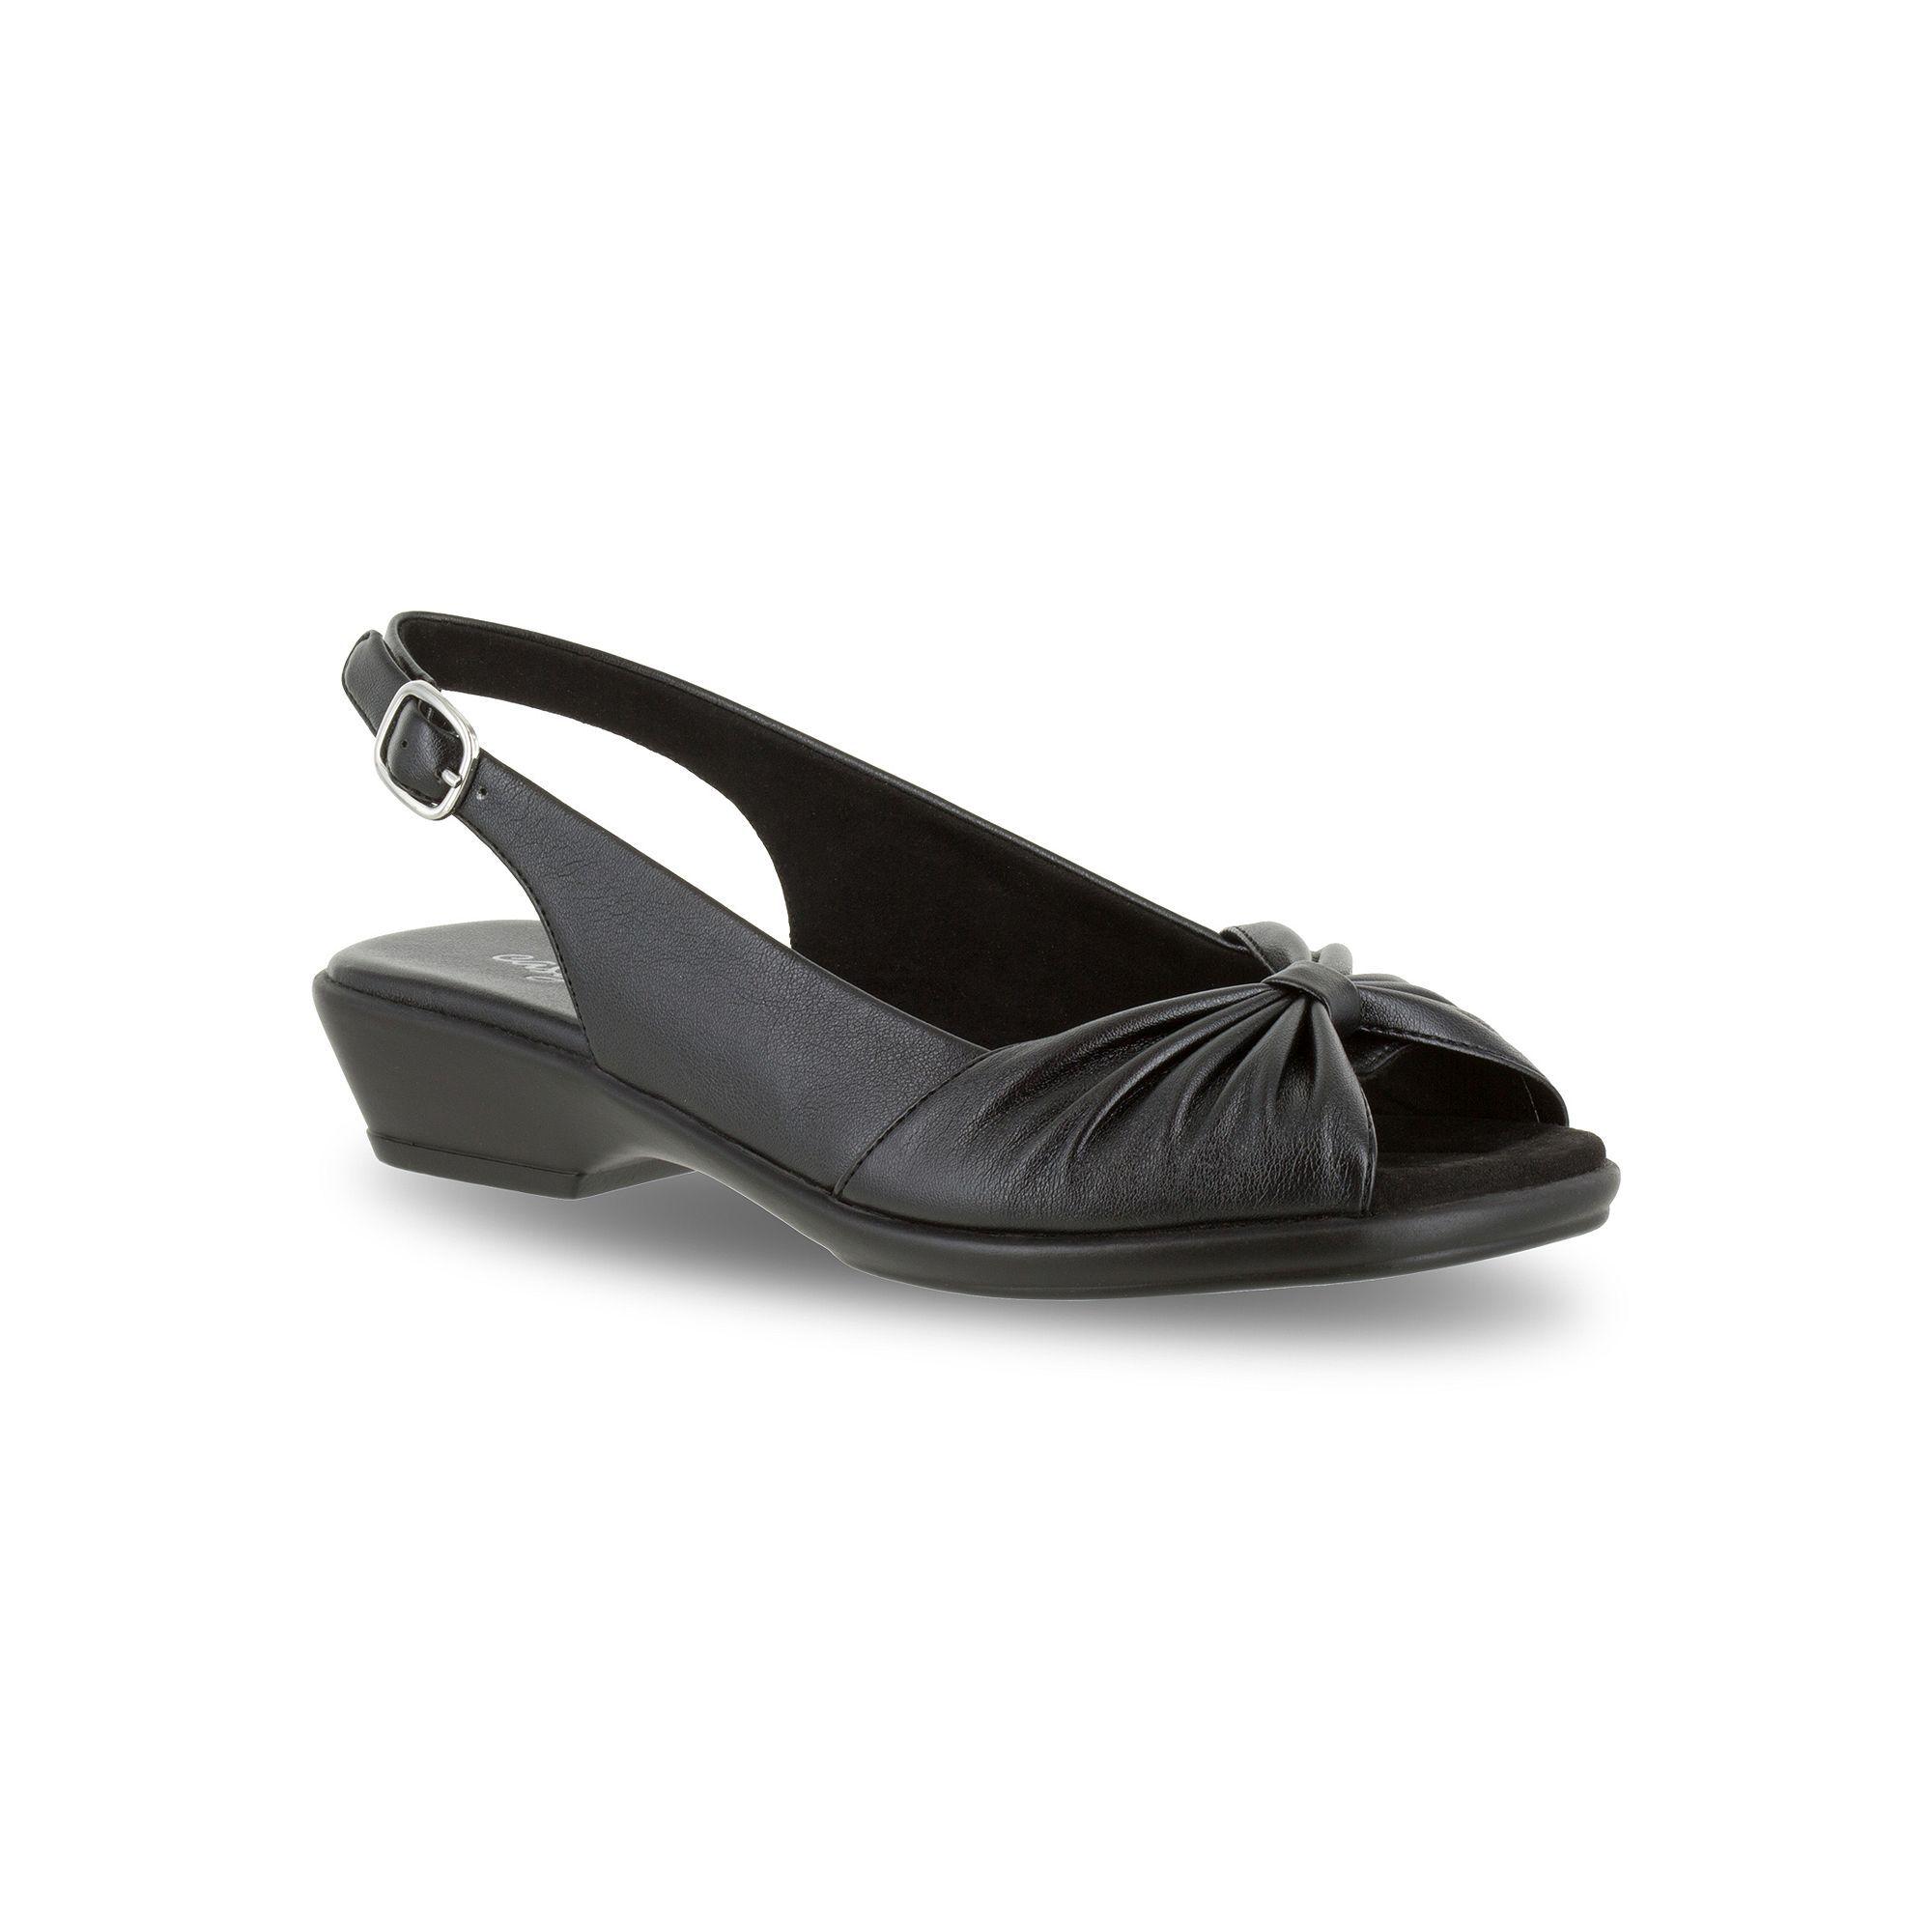 Easy Street Fantasia Sandals Women's Shoes dWk0xv3Or